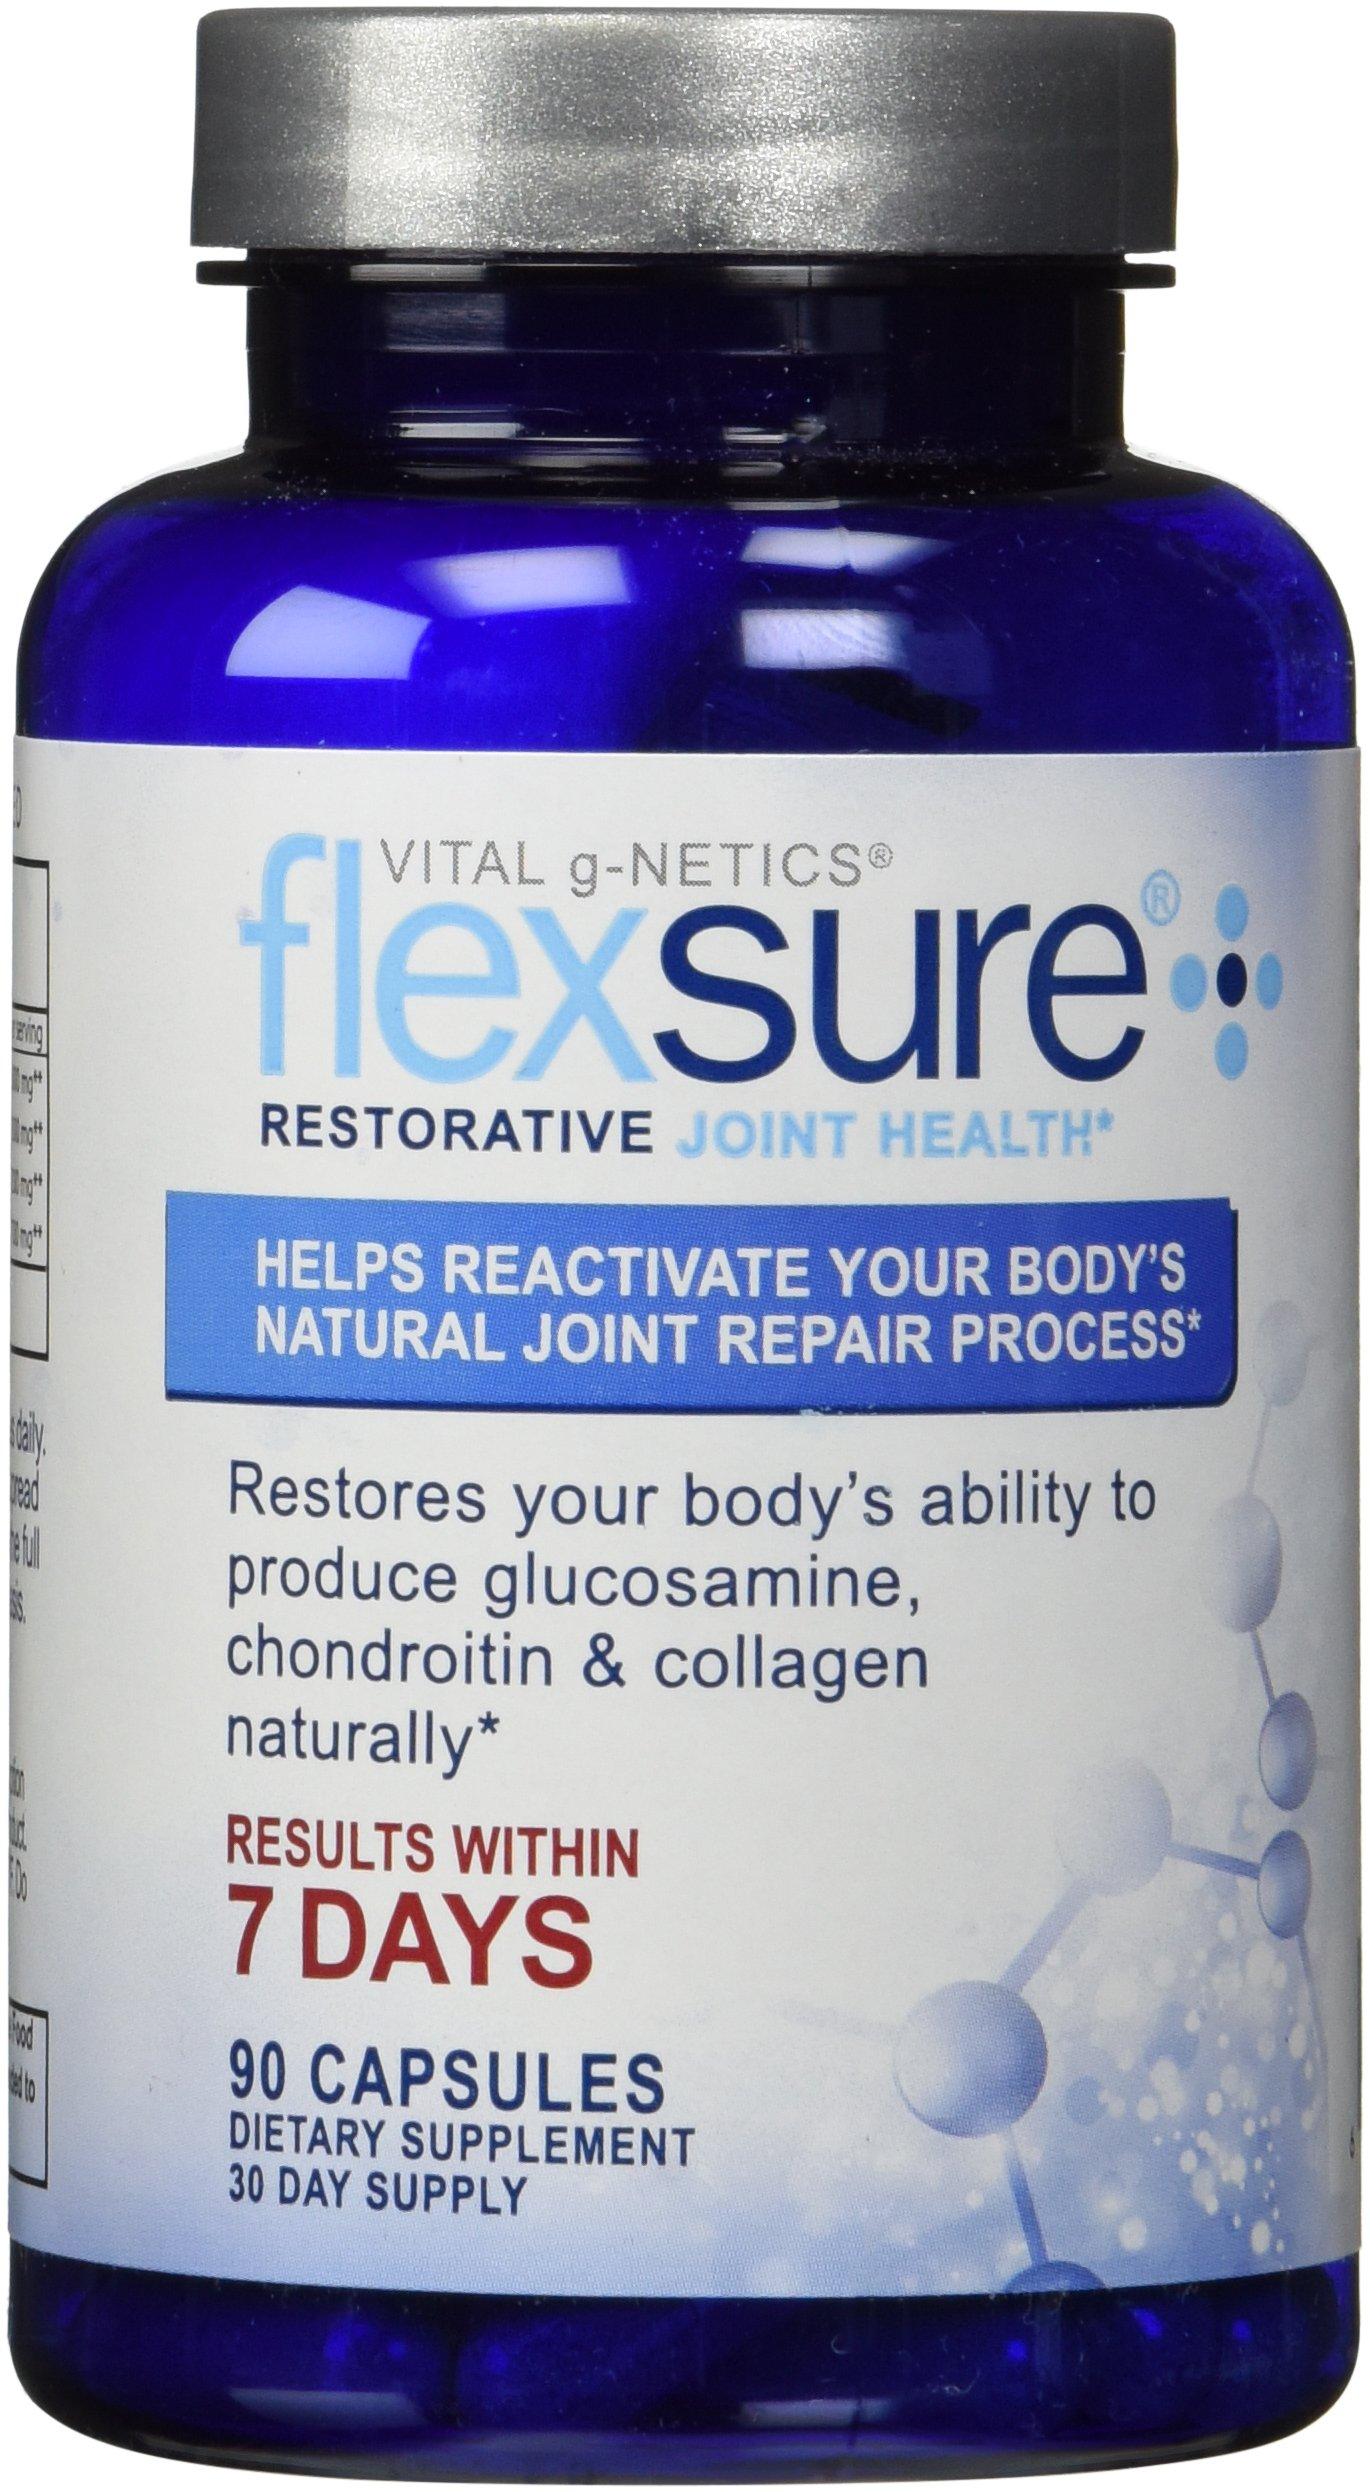 Vital g-Netics Flexsure Restorative Joint Health 90 Caps by Unknown (Image #1)